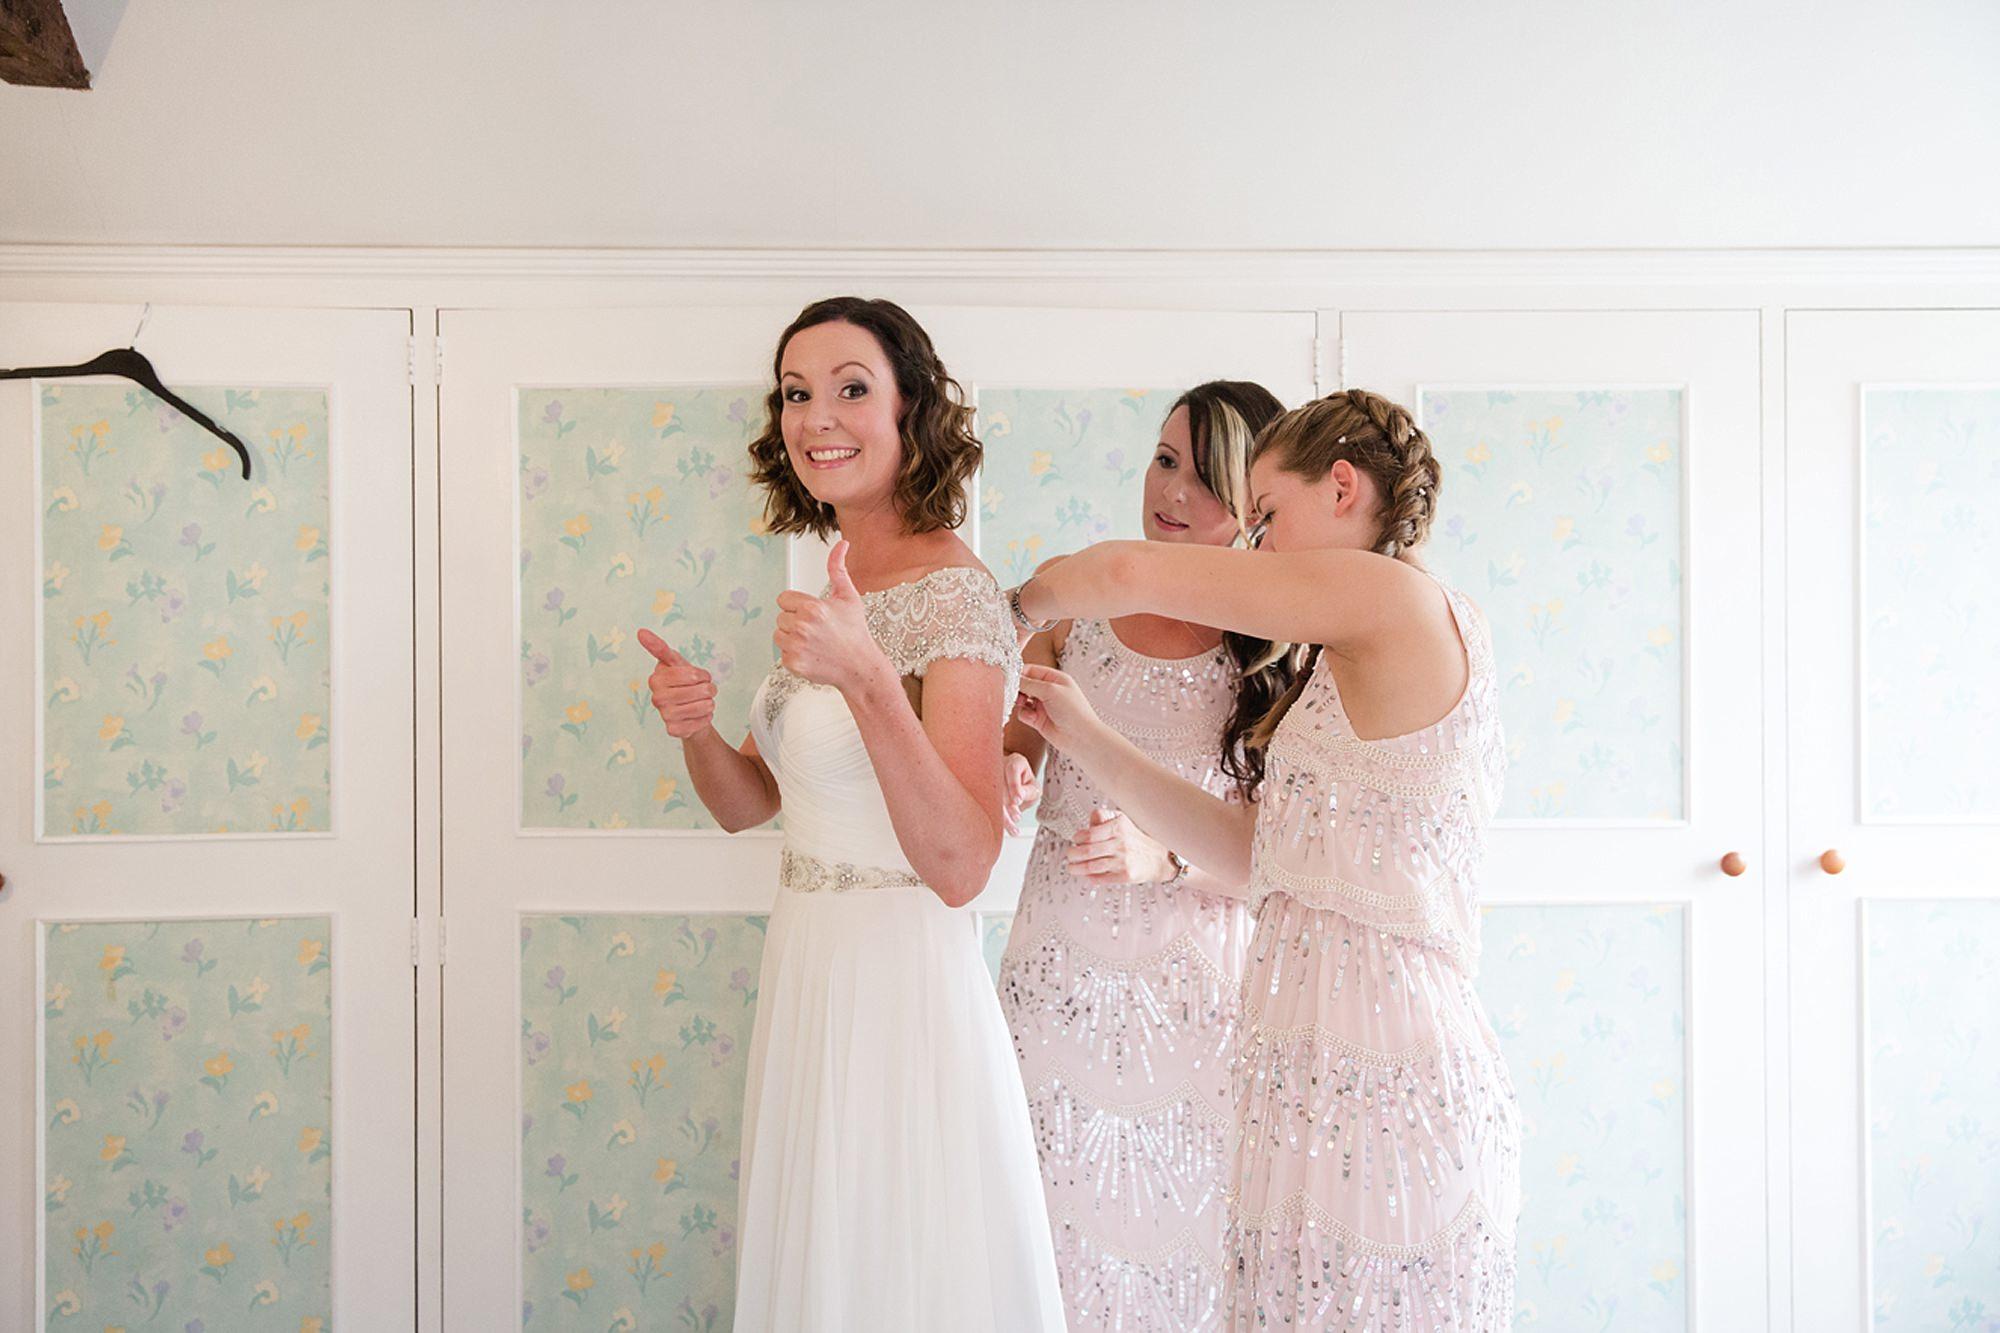 outdoor humanist wedding photography happy bride